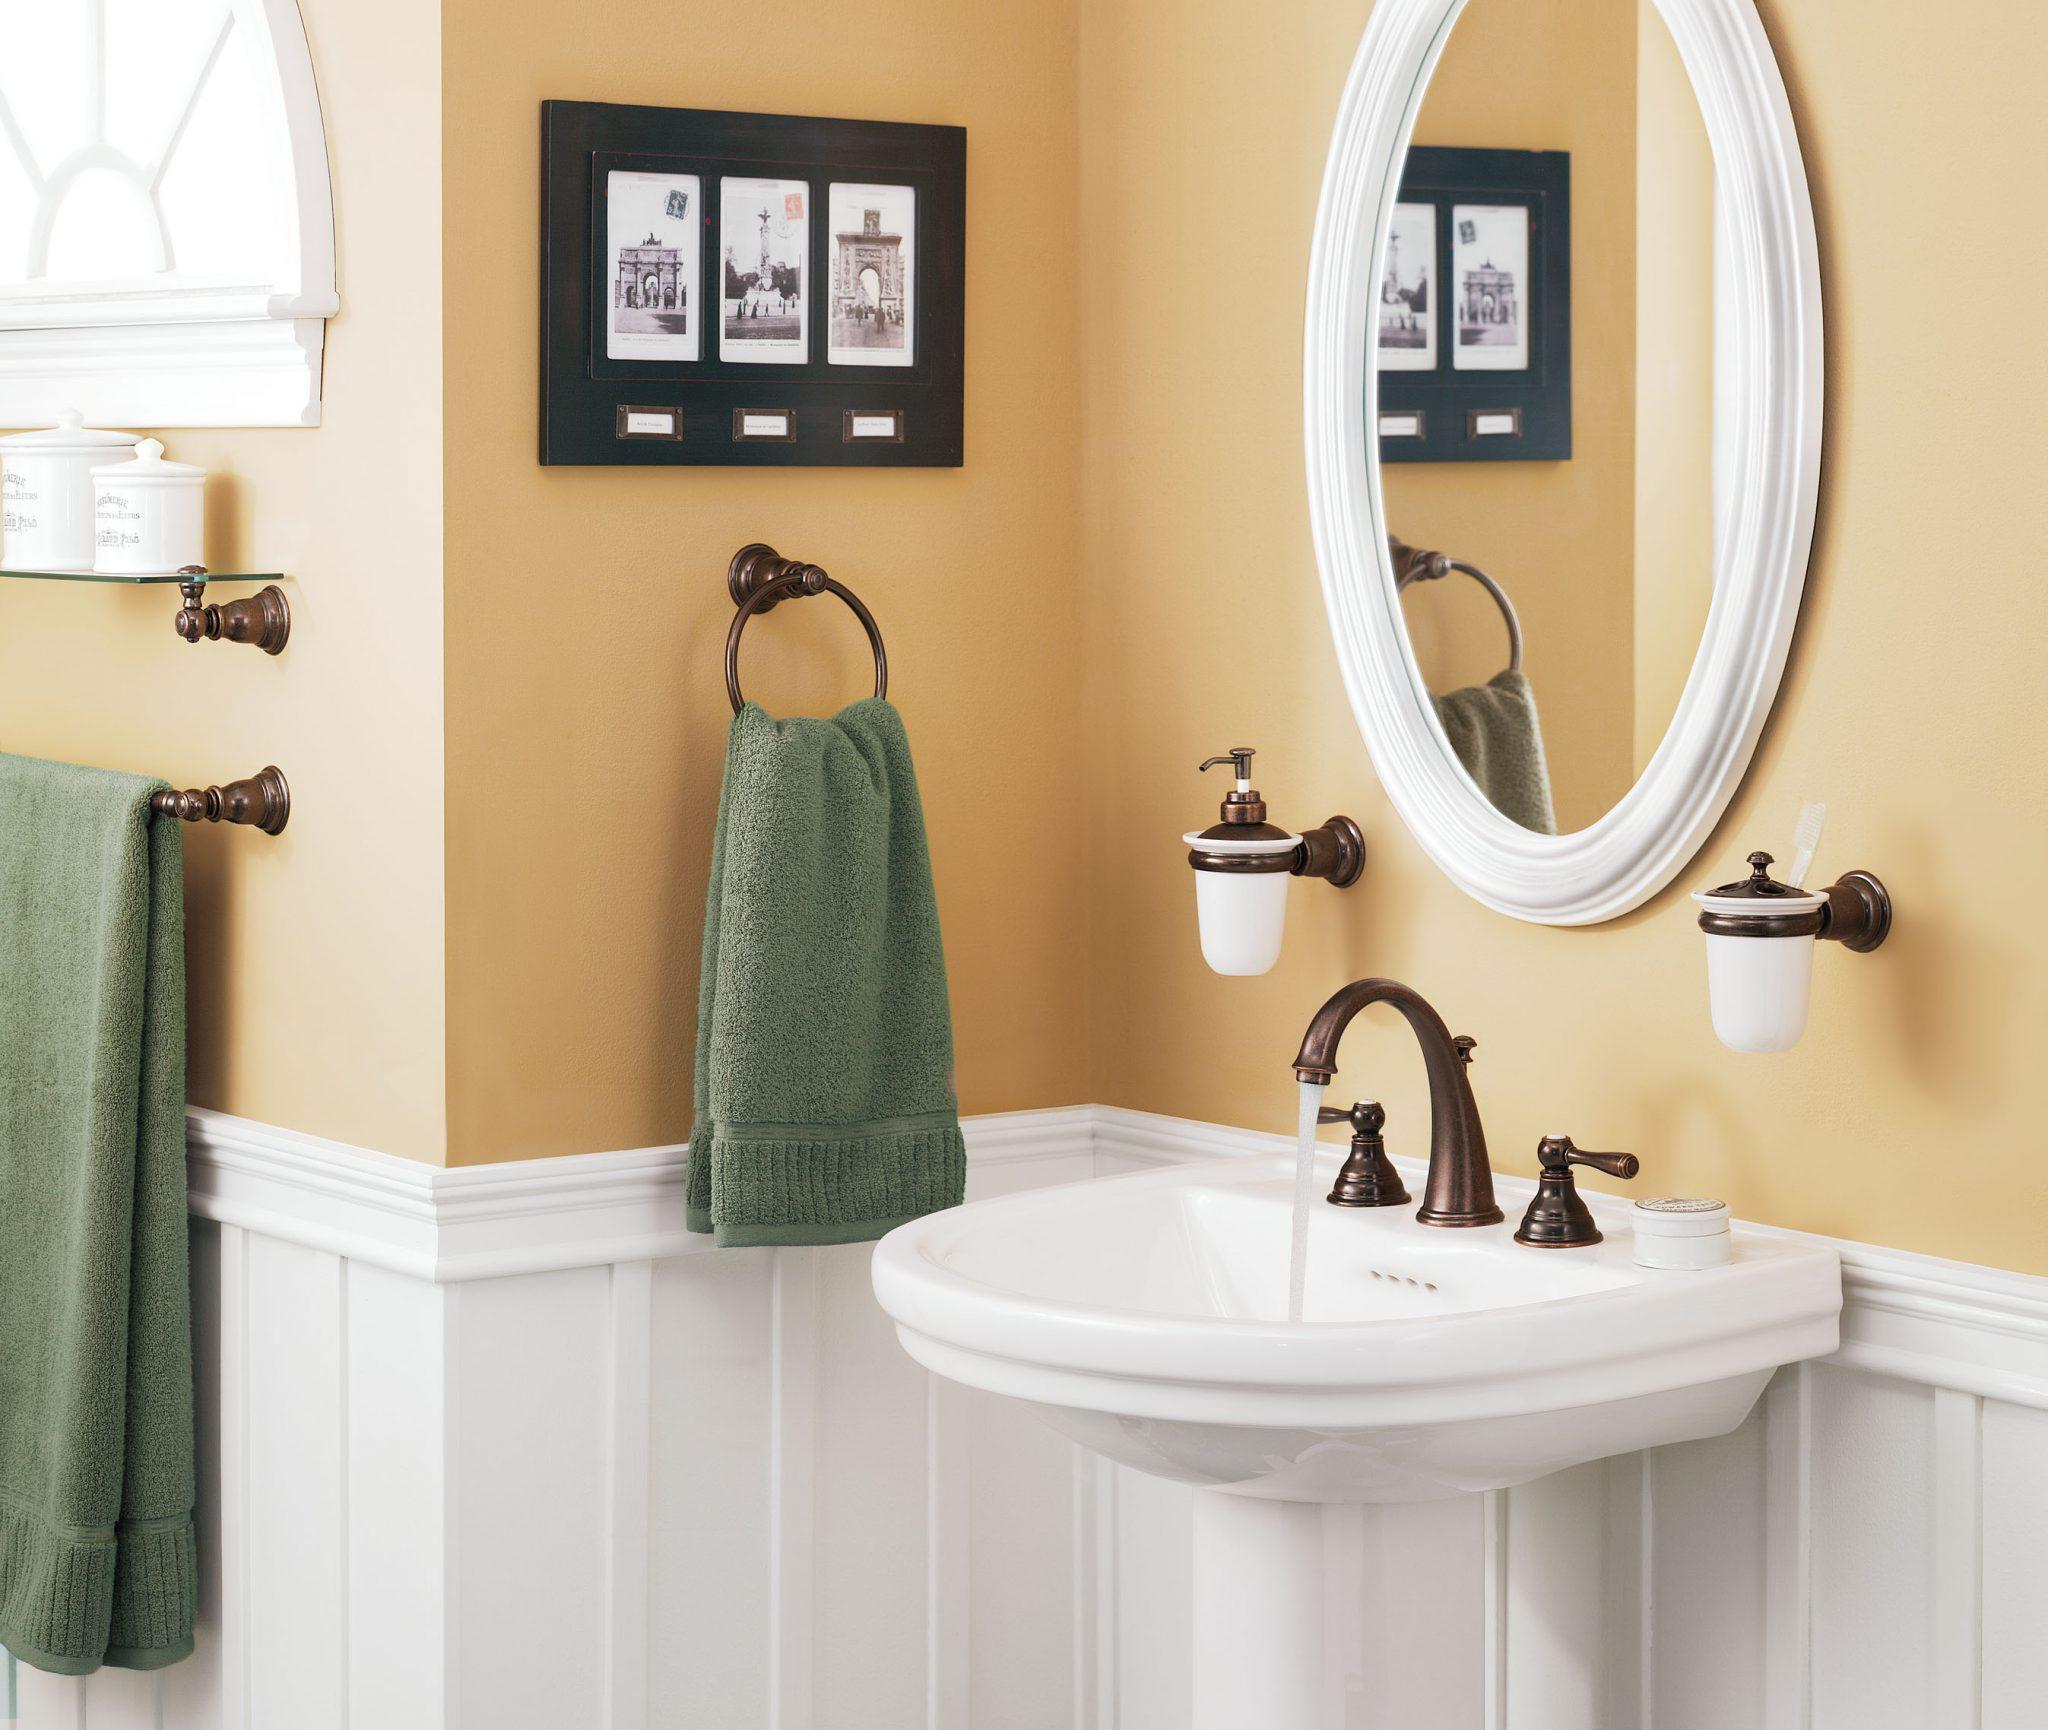 Tips For Creating Luxury Bathrooms With Acrylic Liners - Acrylic bathroom remodeling